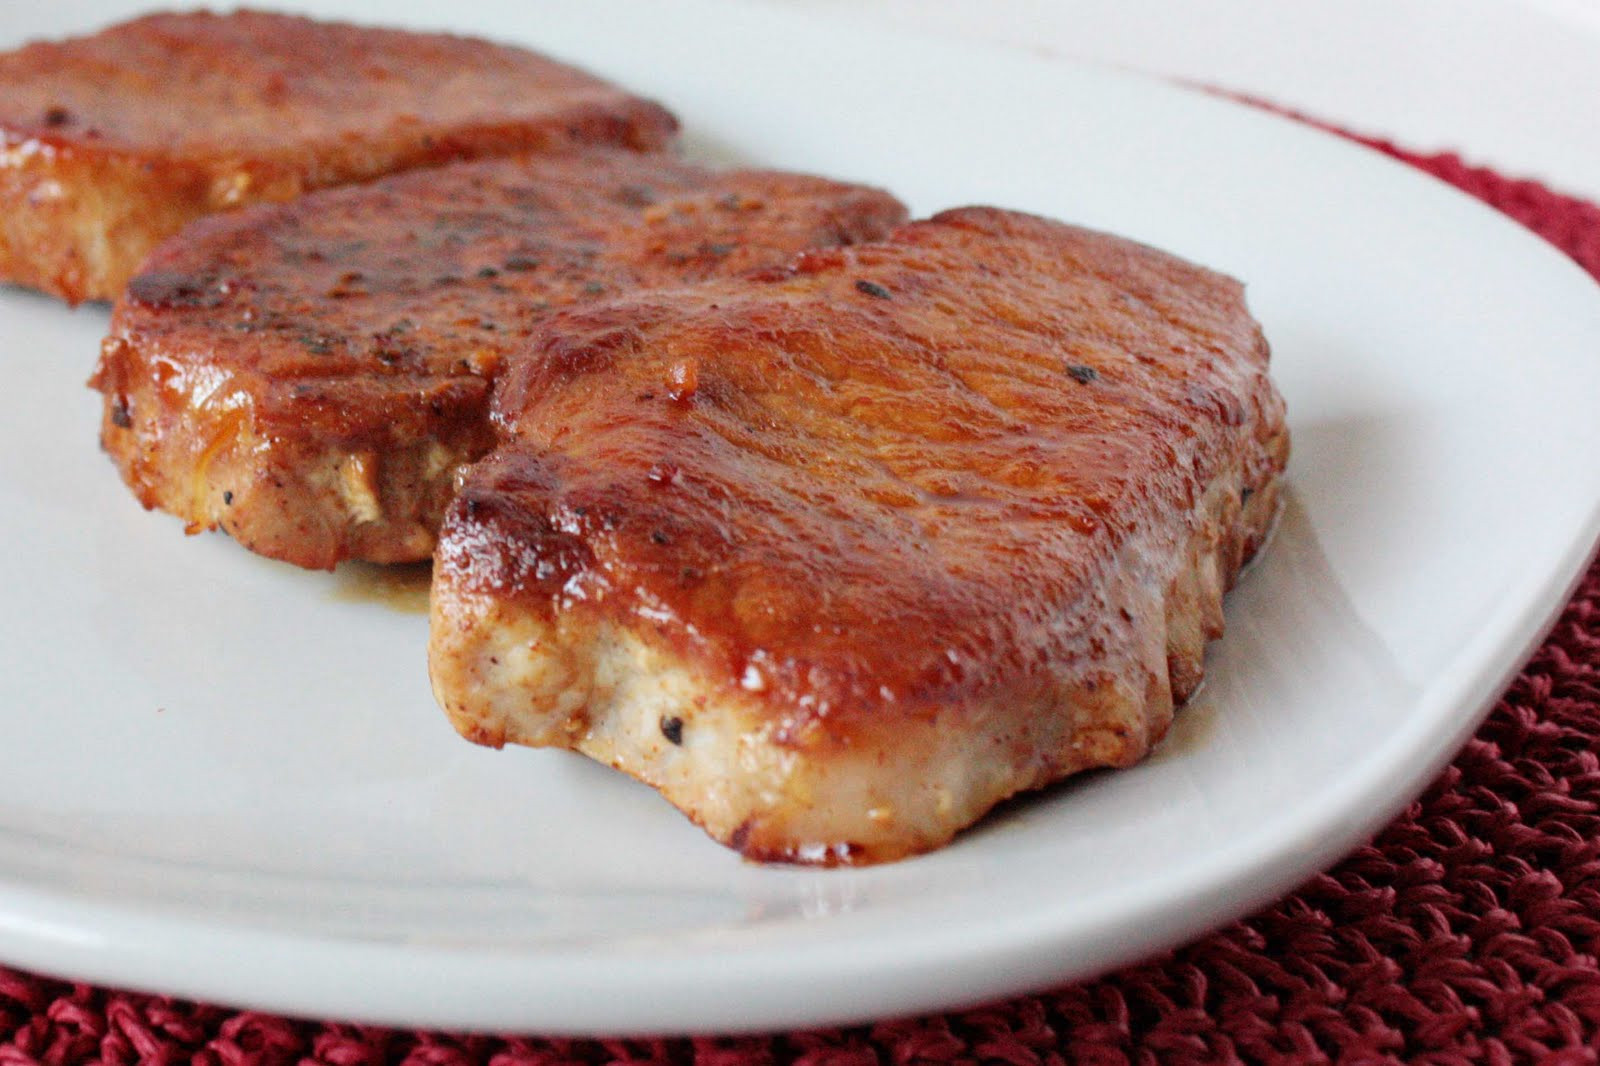 Bake Boneless Pork Chops  Momma Hen s Kitchen Honey Garlic Baked Pork Chops